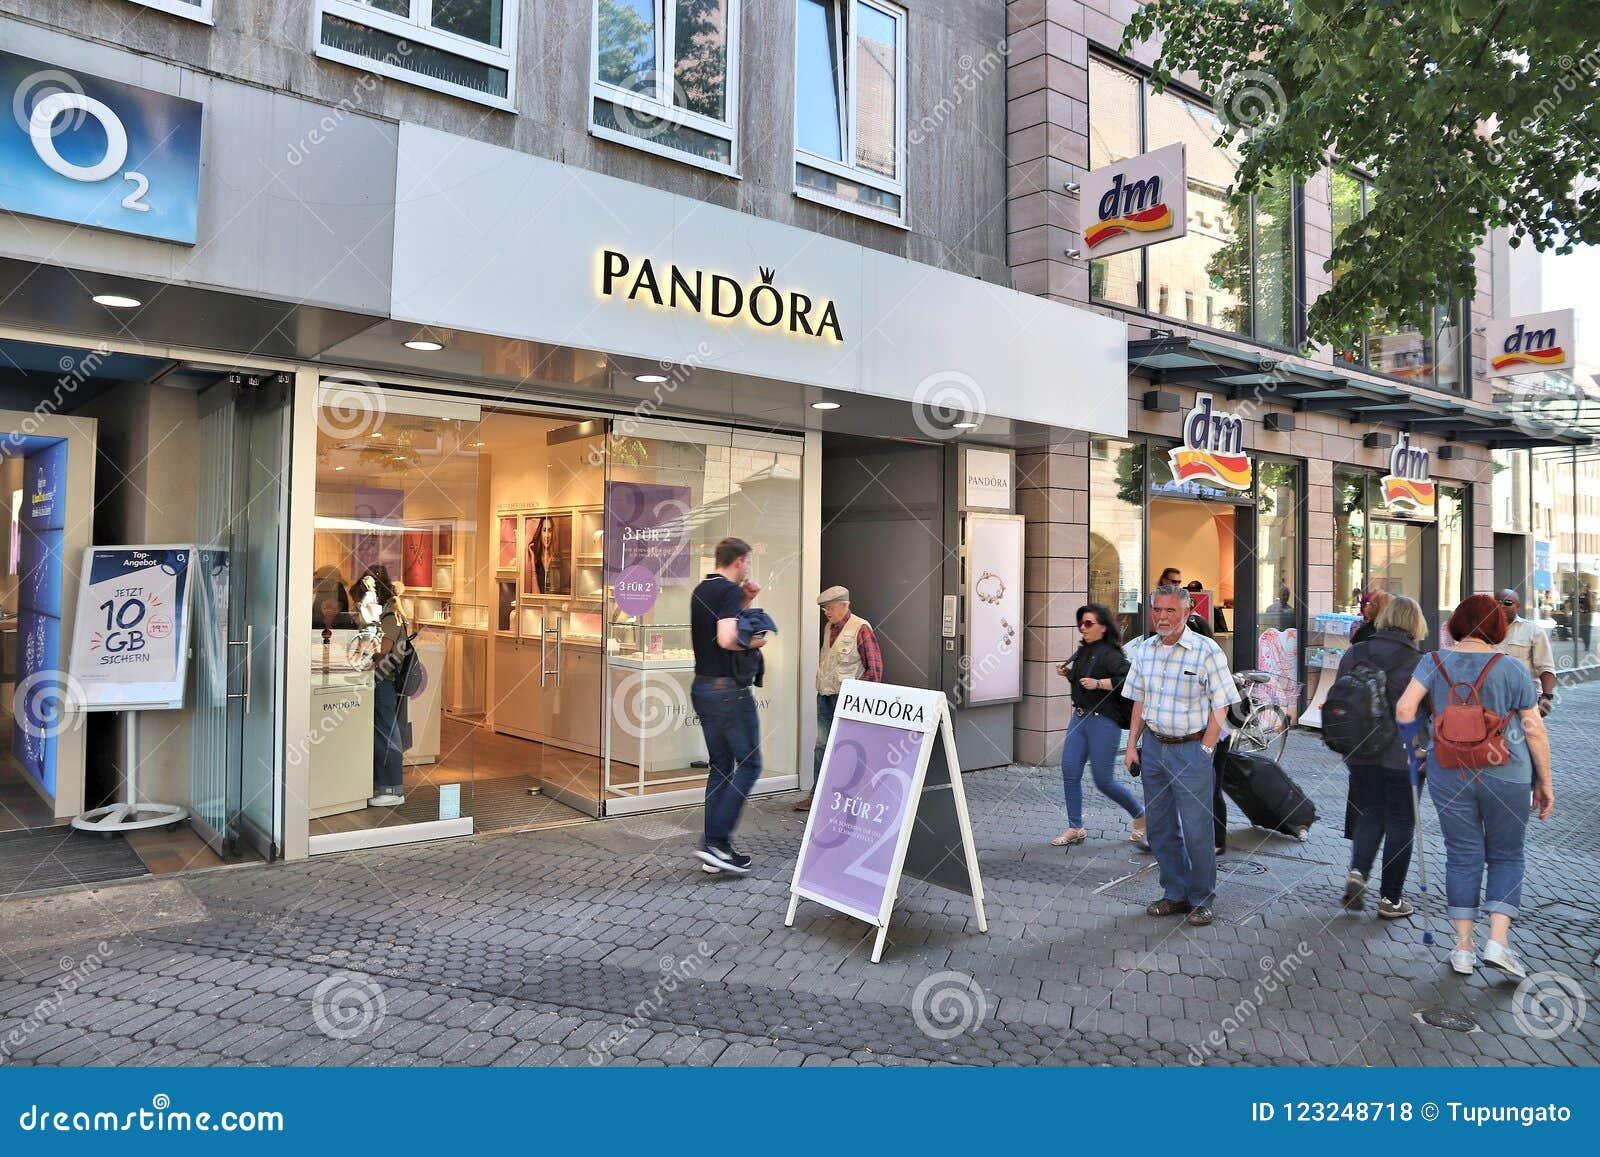 8e3974f21 NUREMBERG, GERMANY - MAY 7, 2018: People walk by Pandora jewelry store at  Karolinenstrasse shopping street in Nuremberg, Germany.